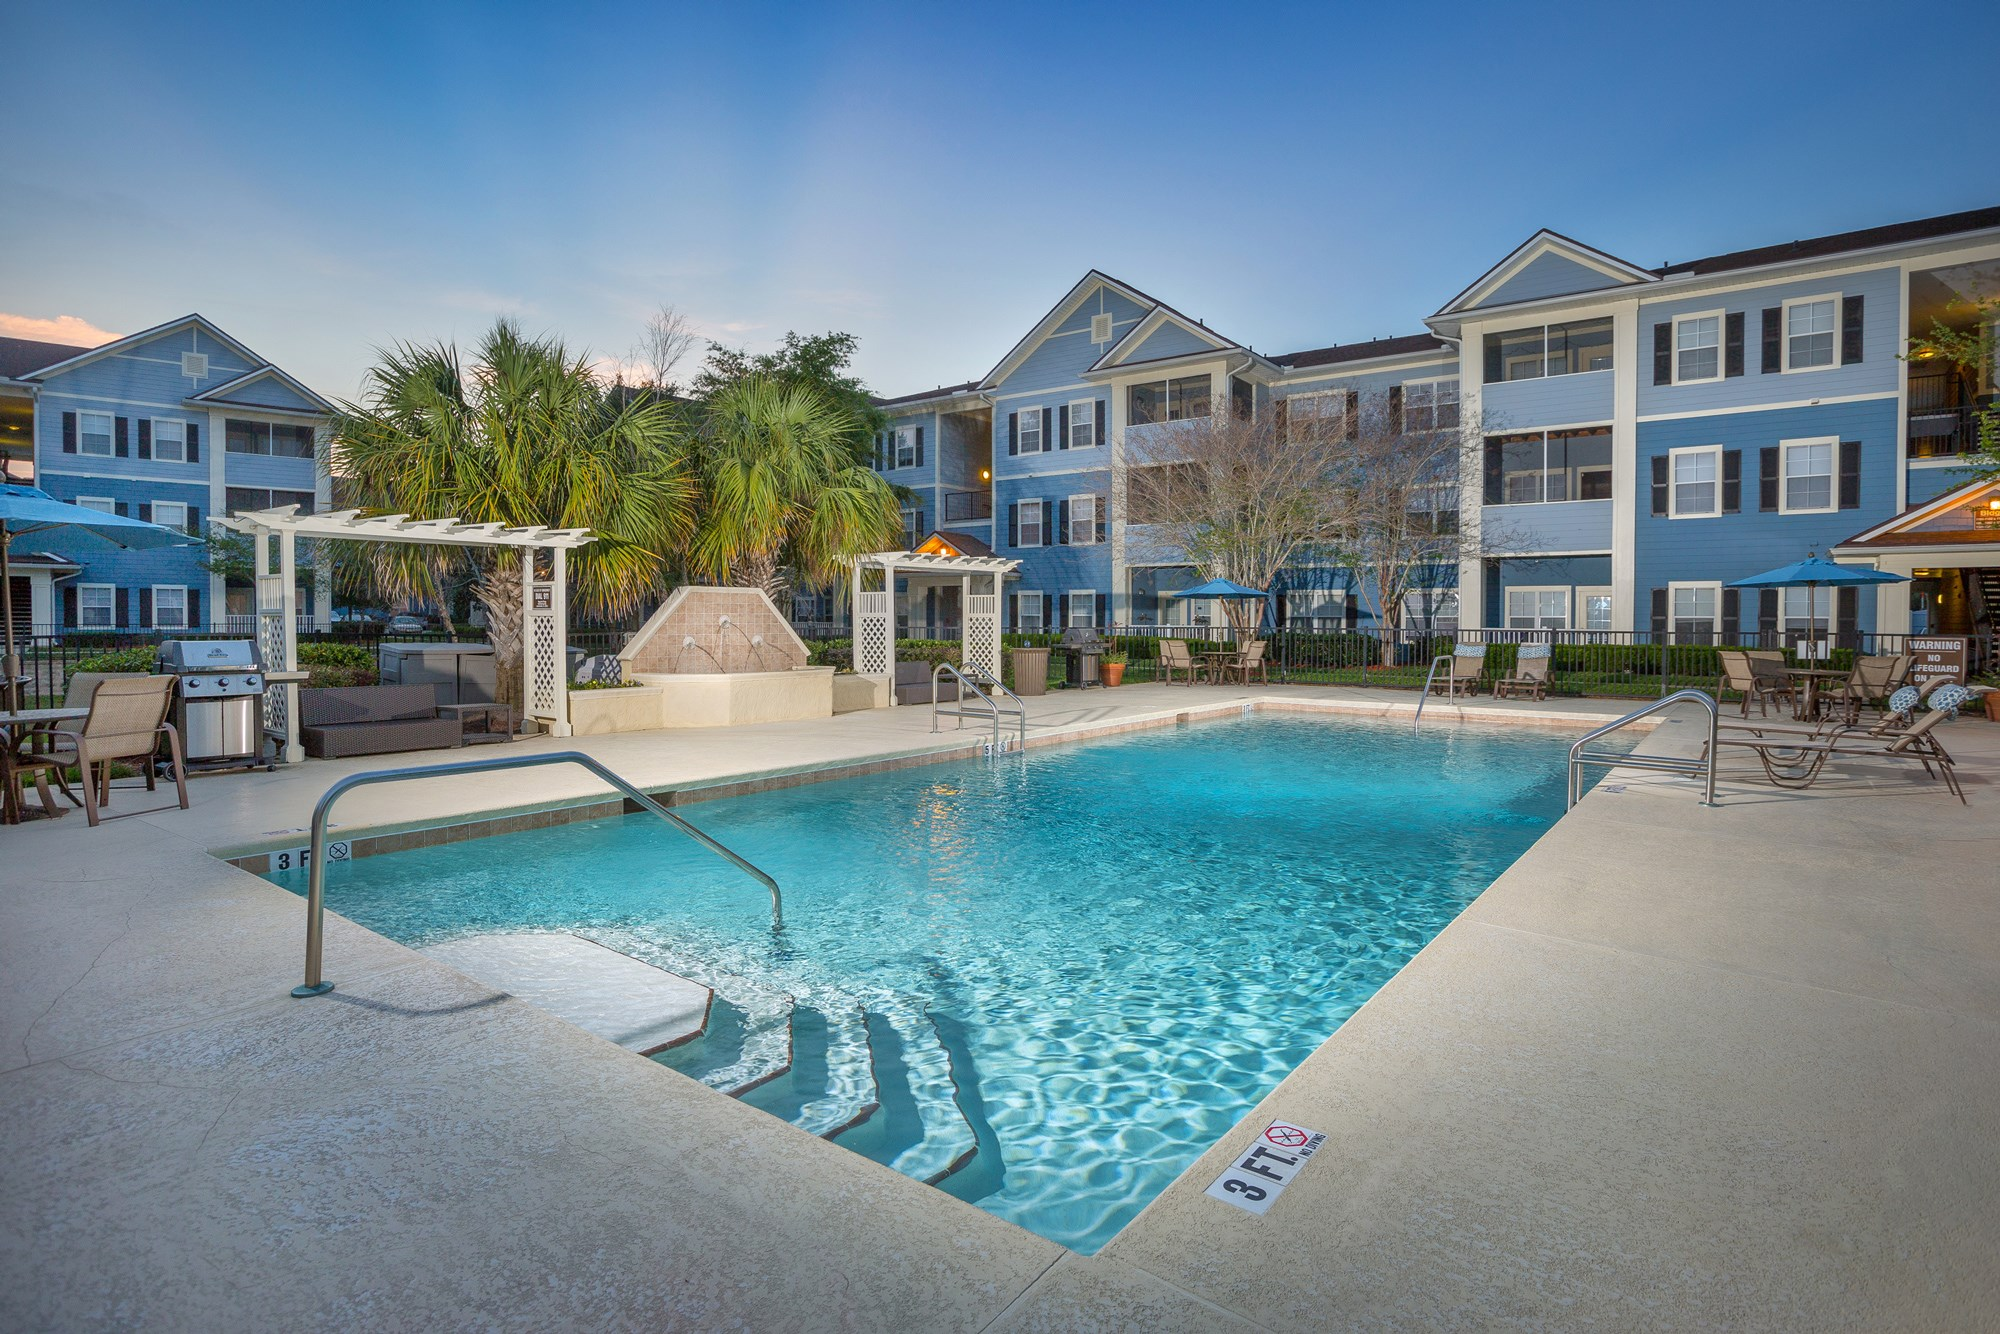 Swimming Pool at Magnolia Village Apartments in Jacksonville, FL